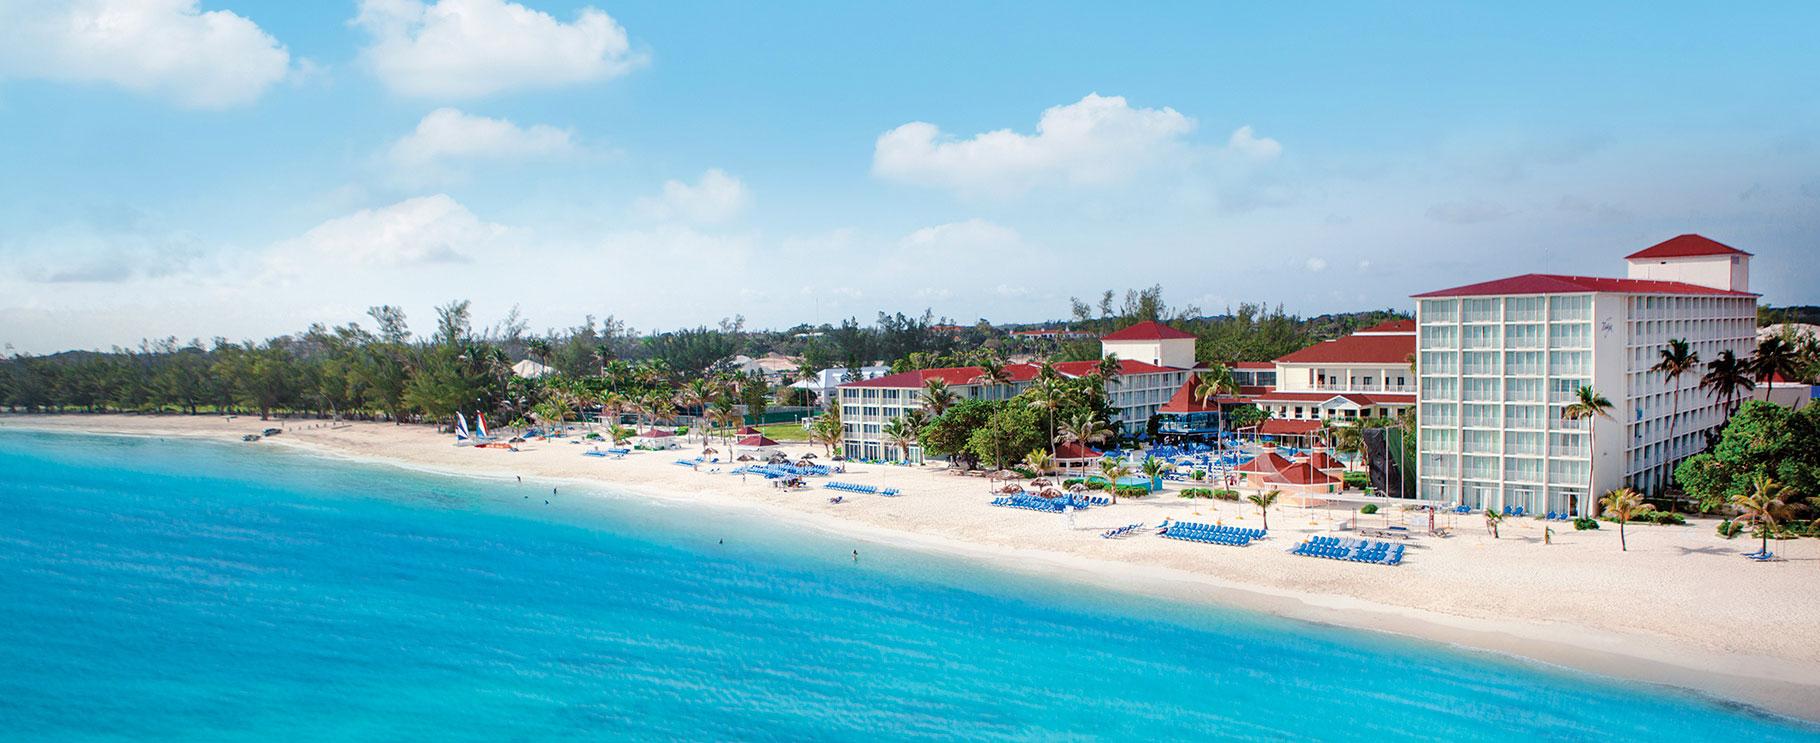 2020 spring break nassau bahamas | sts travel